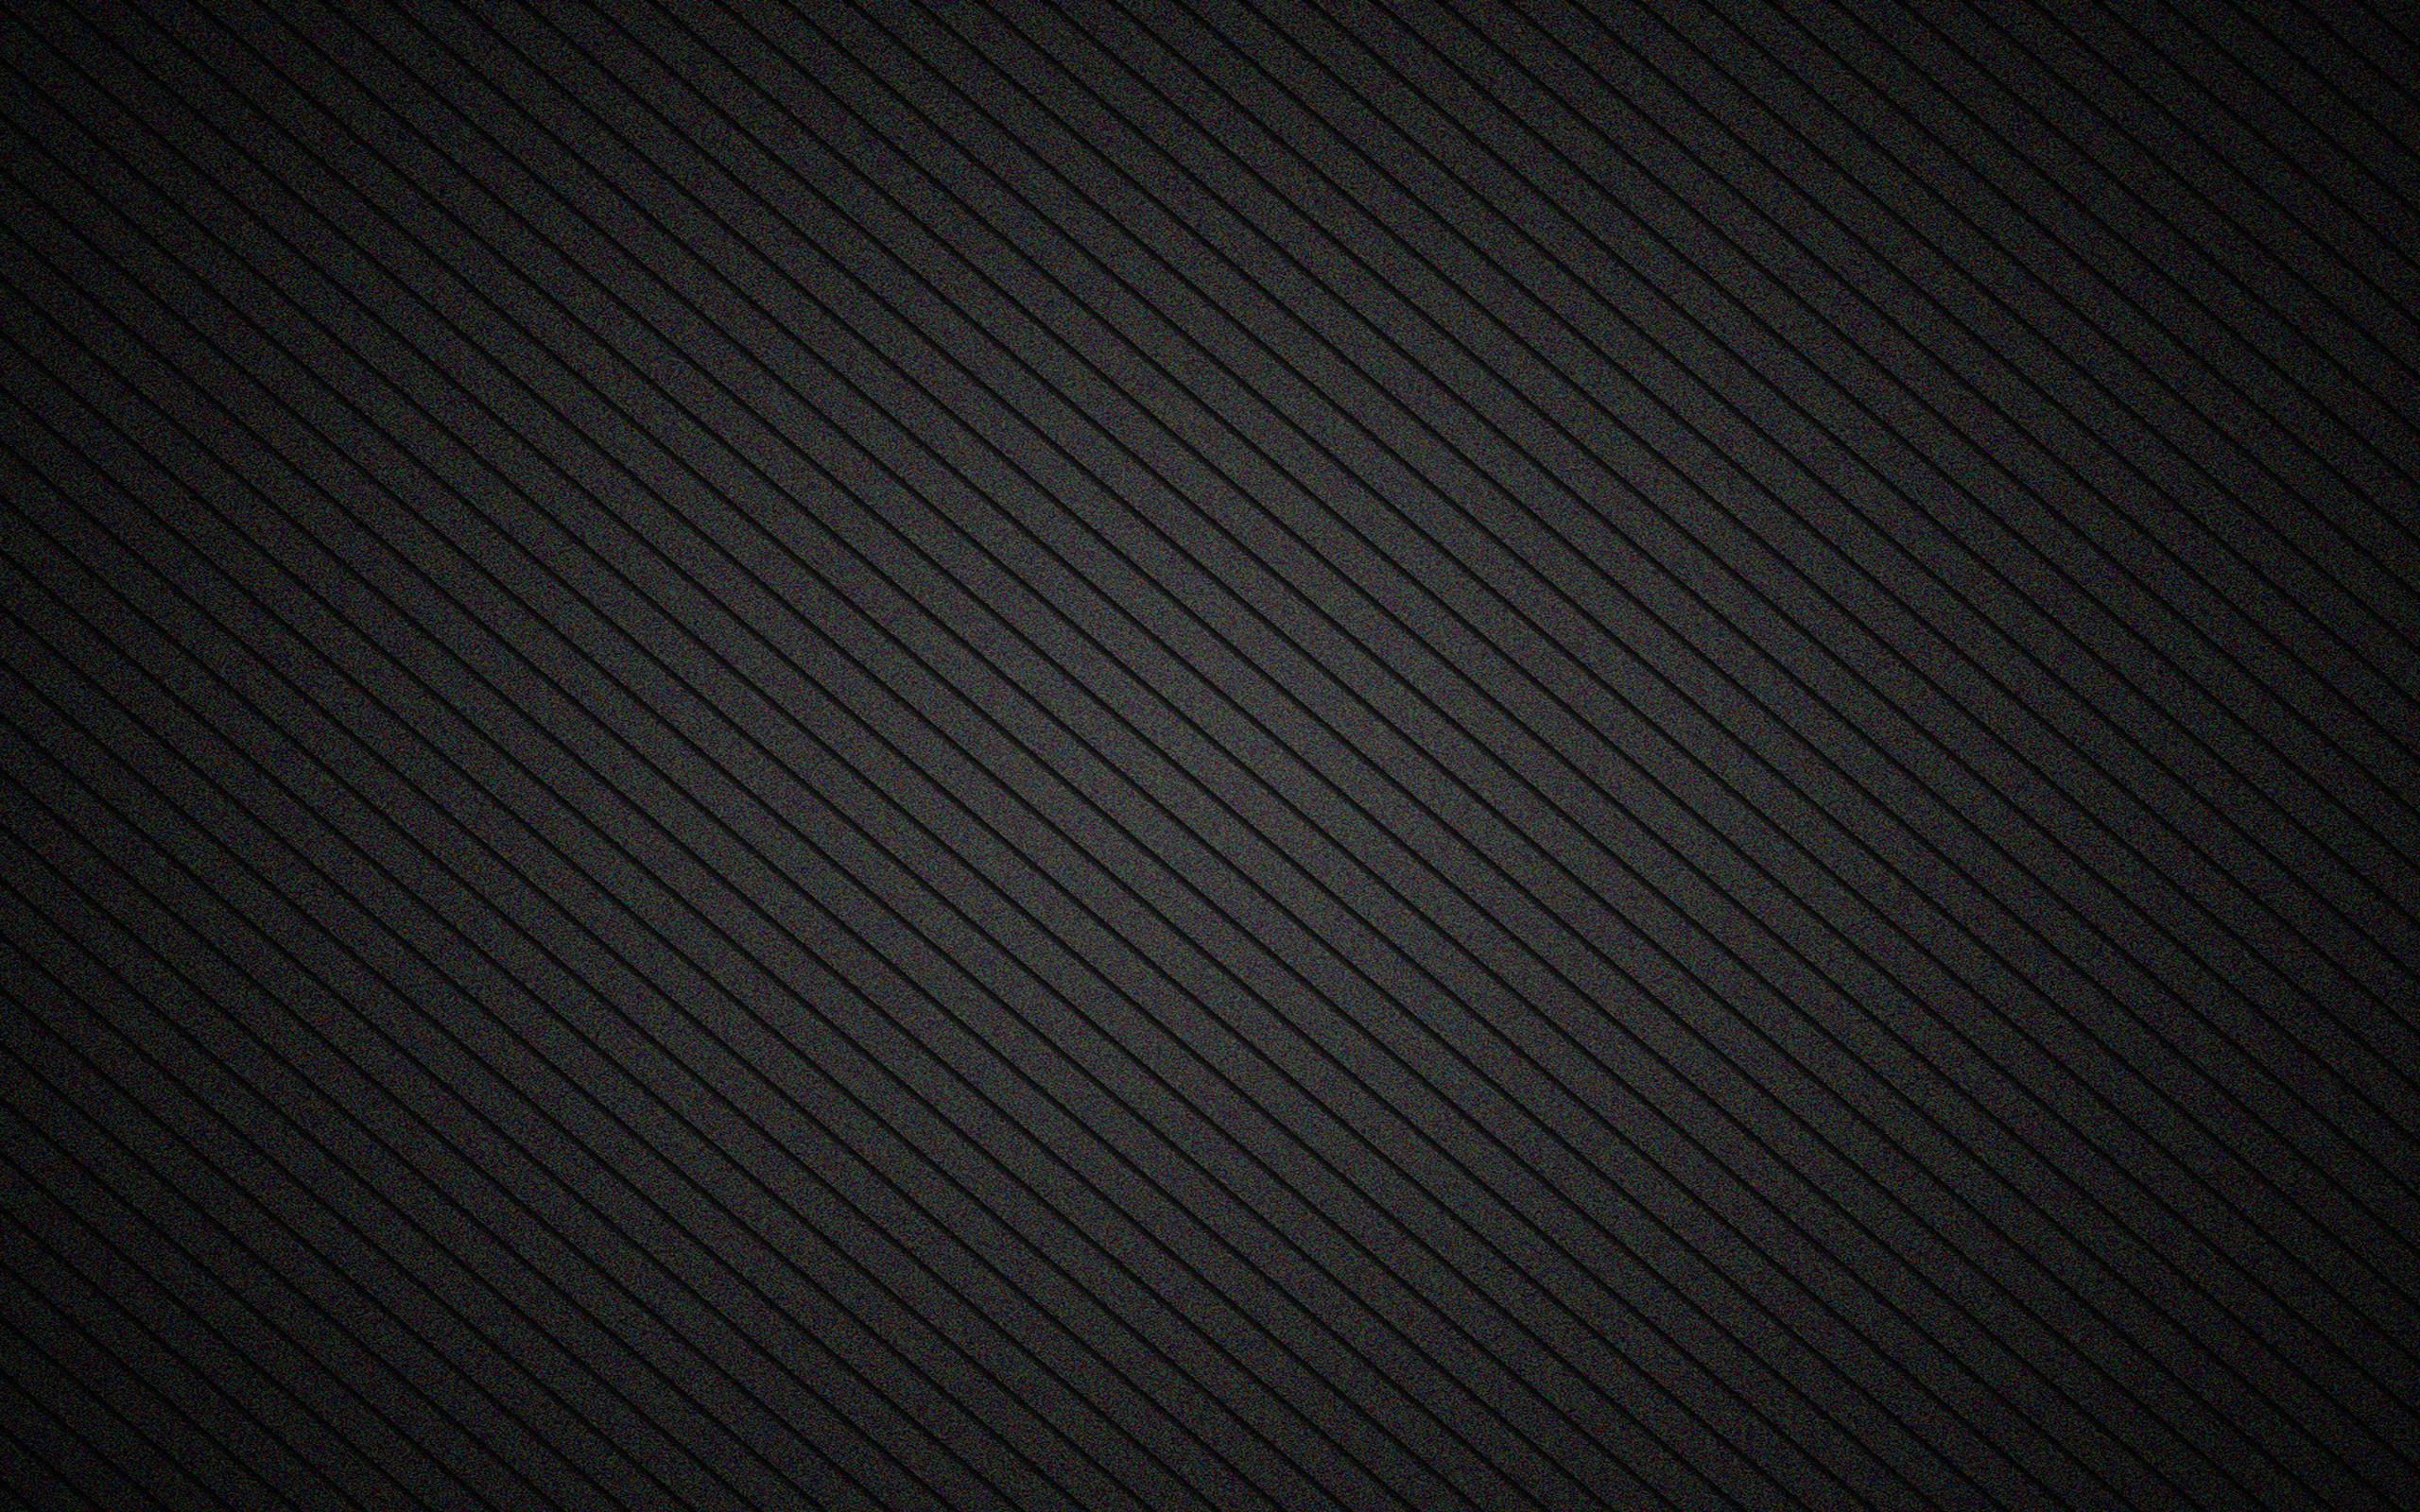 Abstract Diagonal Lines 7299824 Wallpaper wallpaper